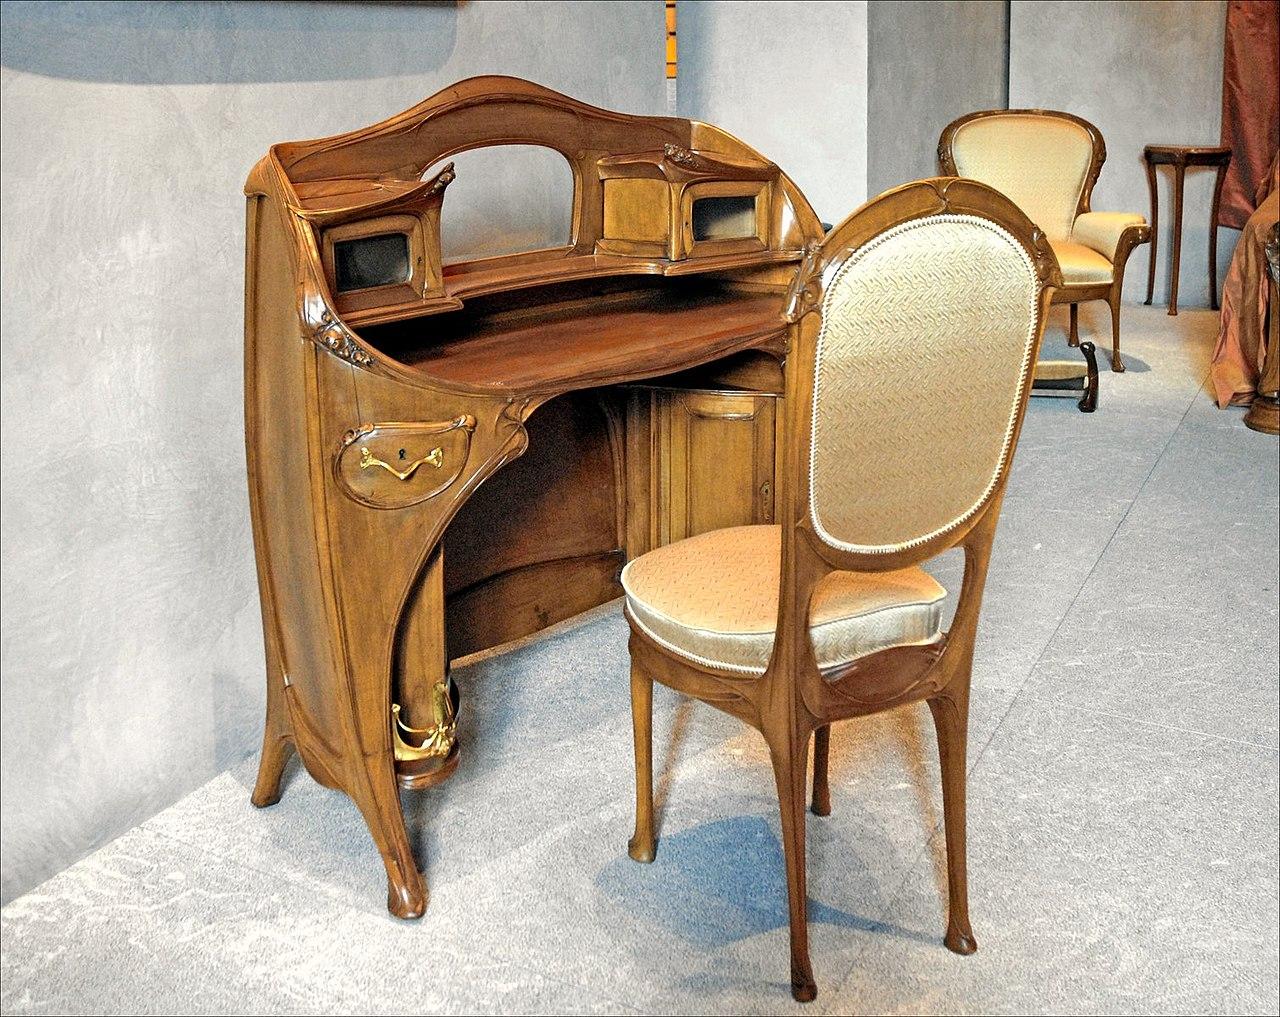 file hector guimard mus e des beaux arts de lyon 5469543414 jpg wikimedia commons. Black Bedroom Furniture Sets. Home Design Ideas